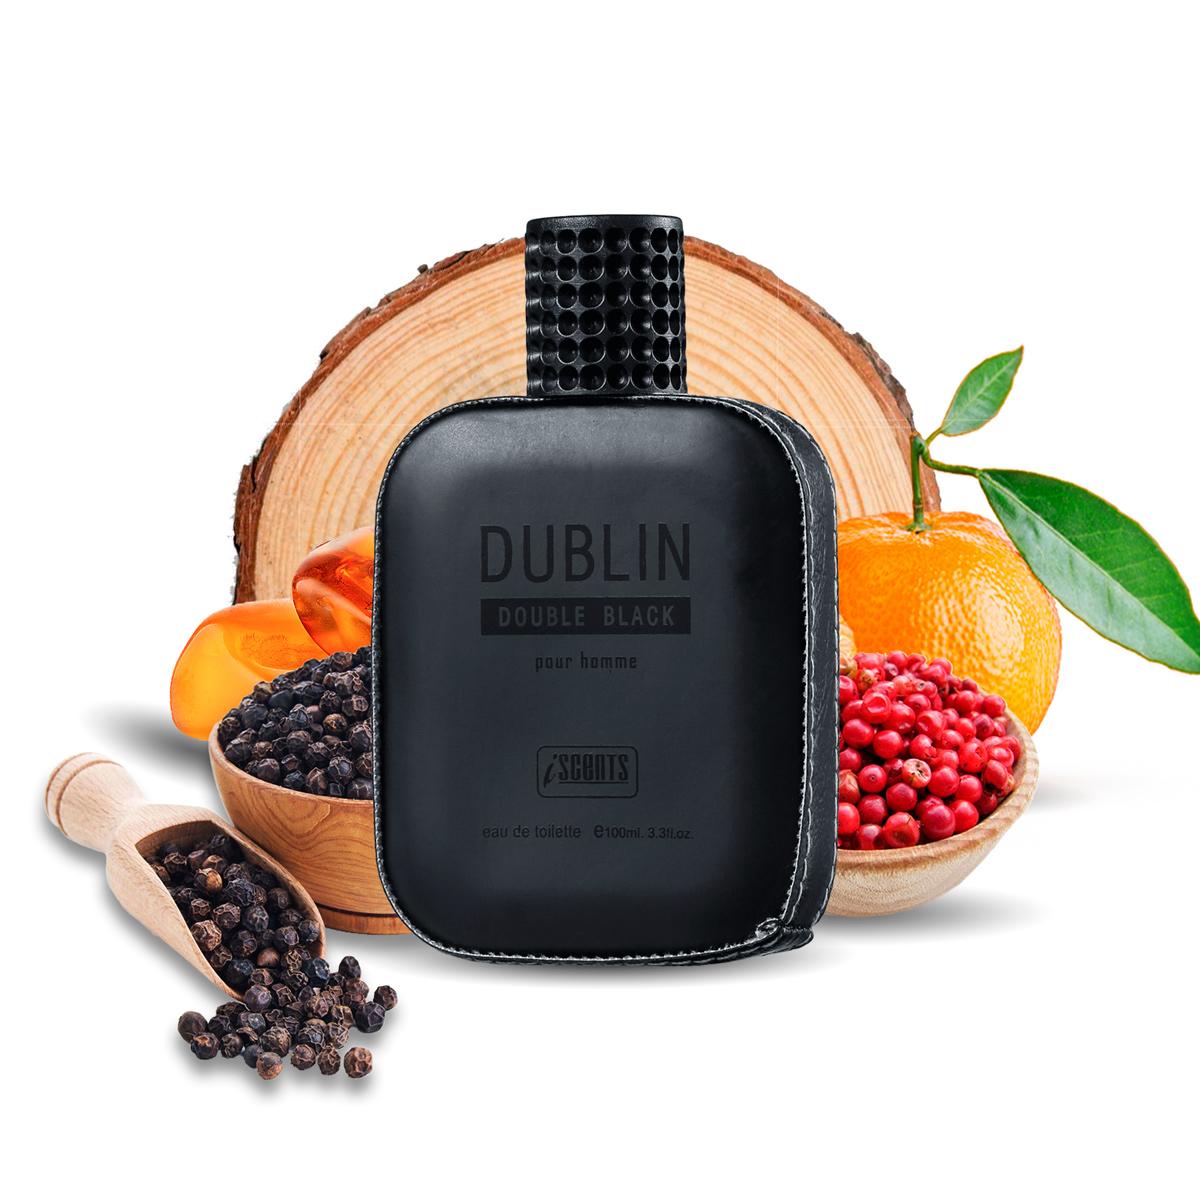 Kit 2 Perfumes Importados Ebon e Dublin I Scents